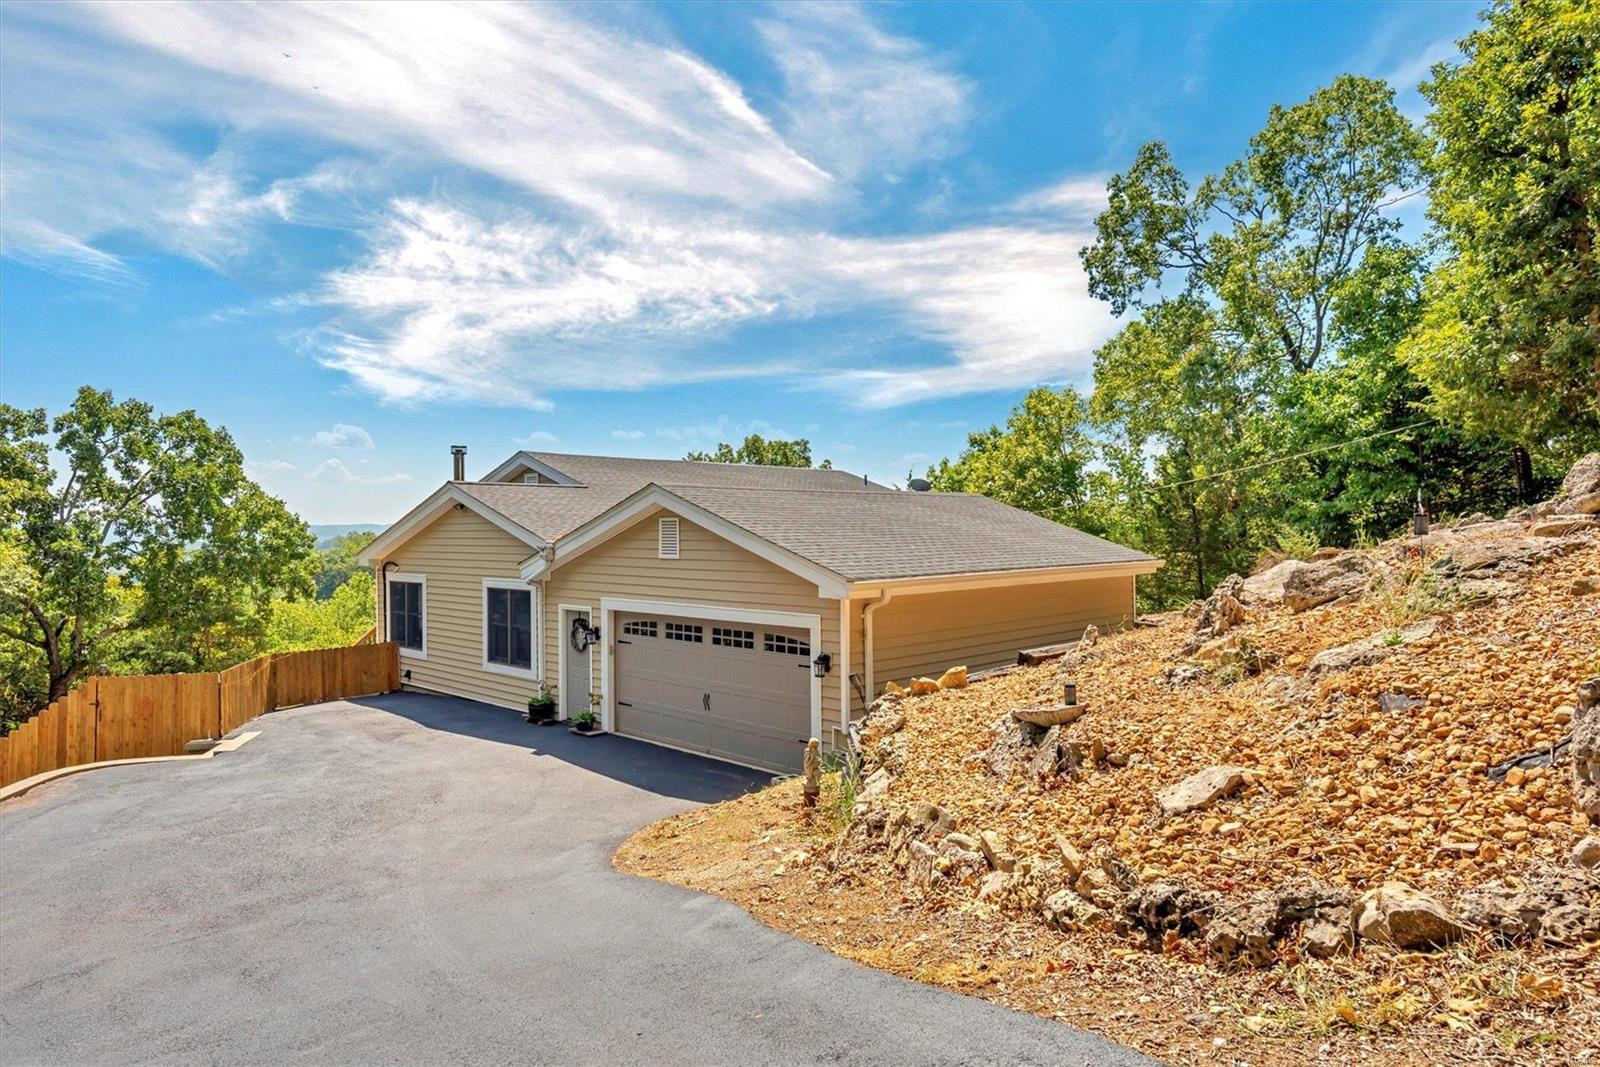 17575 Thunder Mountain Road, Wildwood, MO 63025